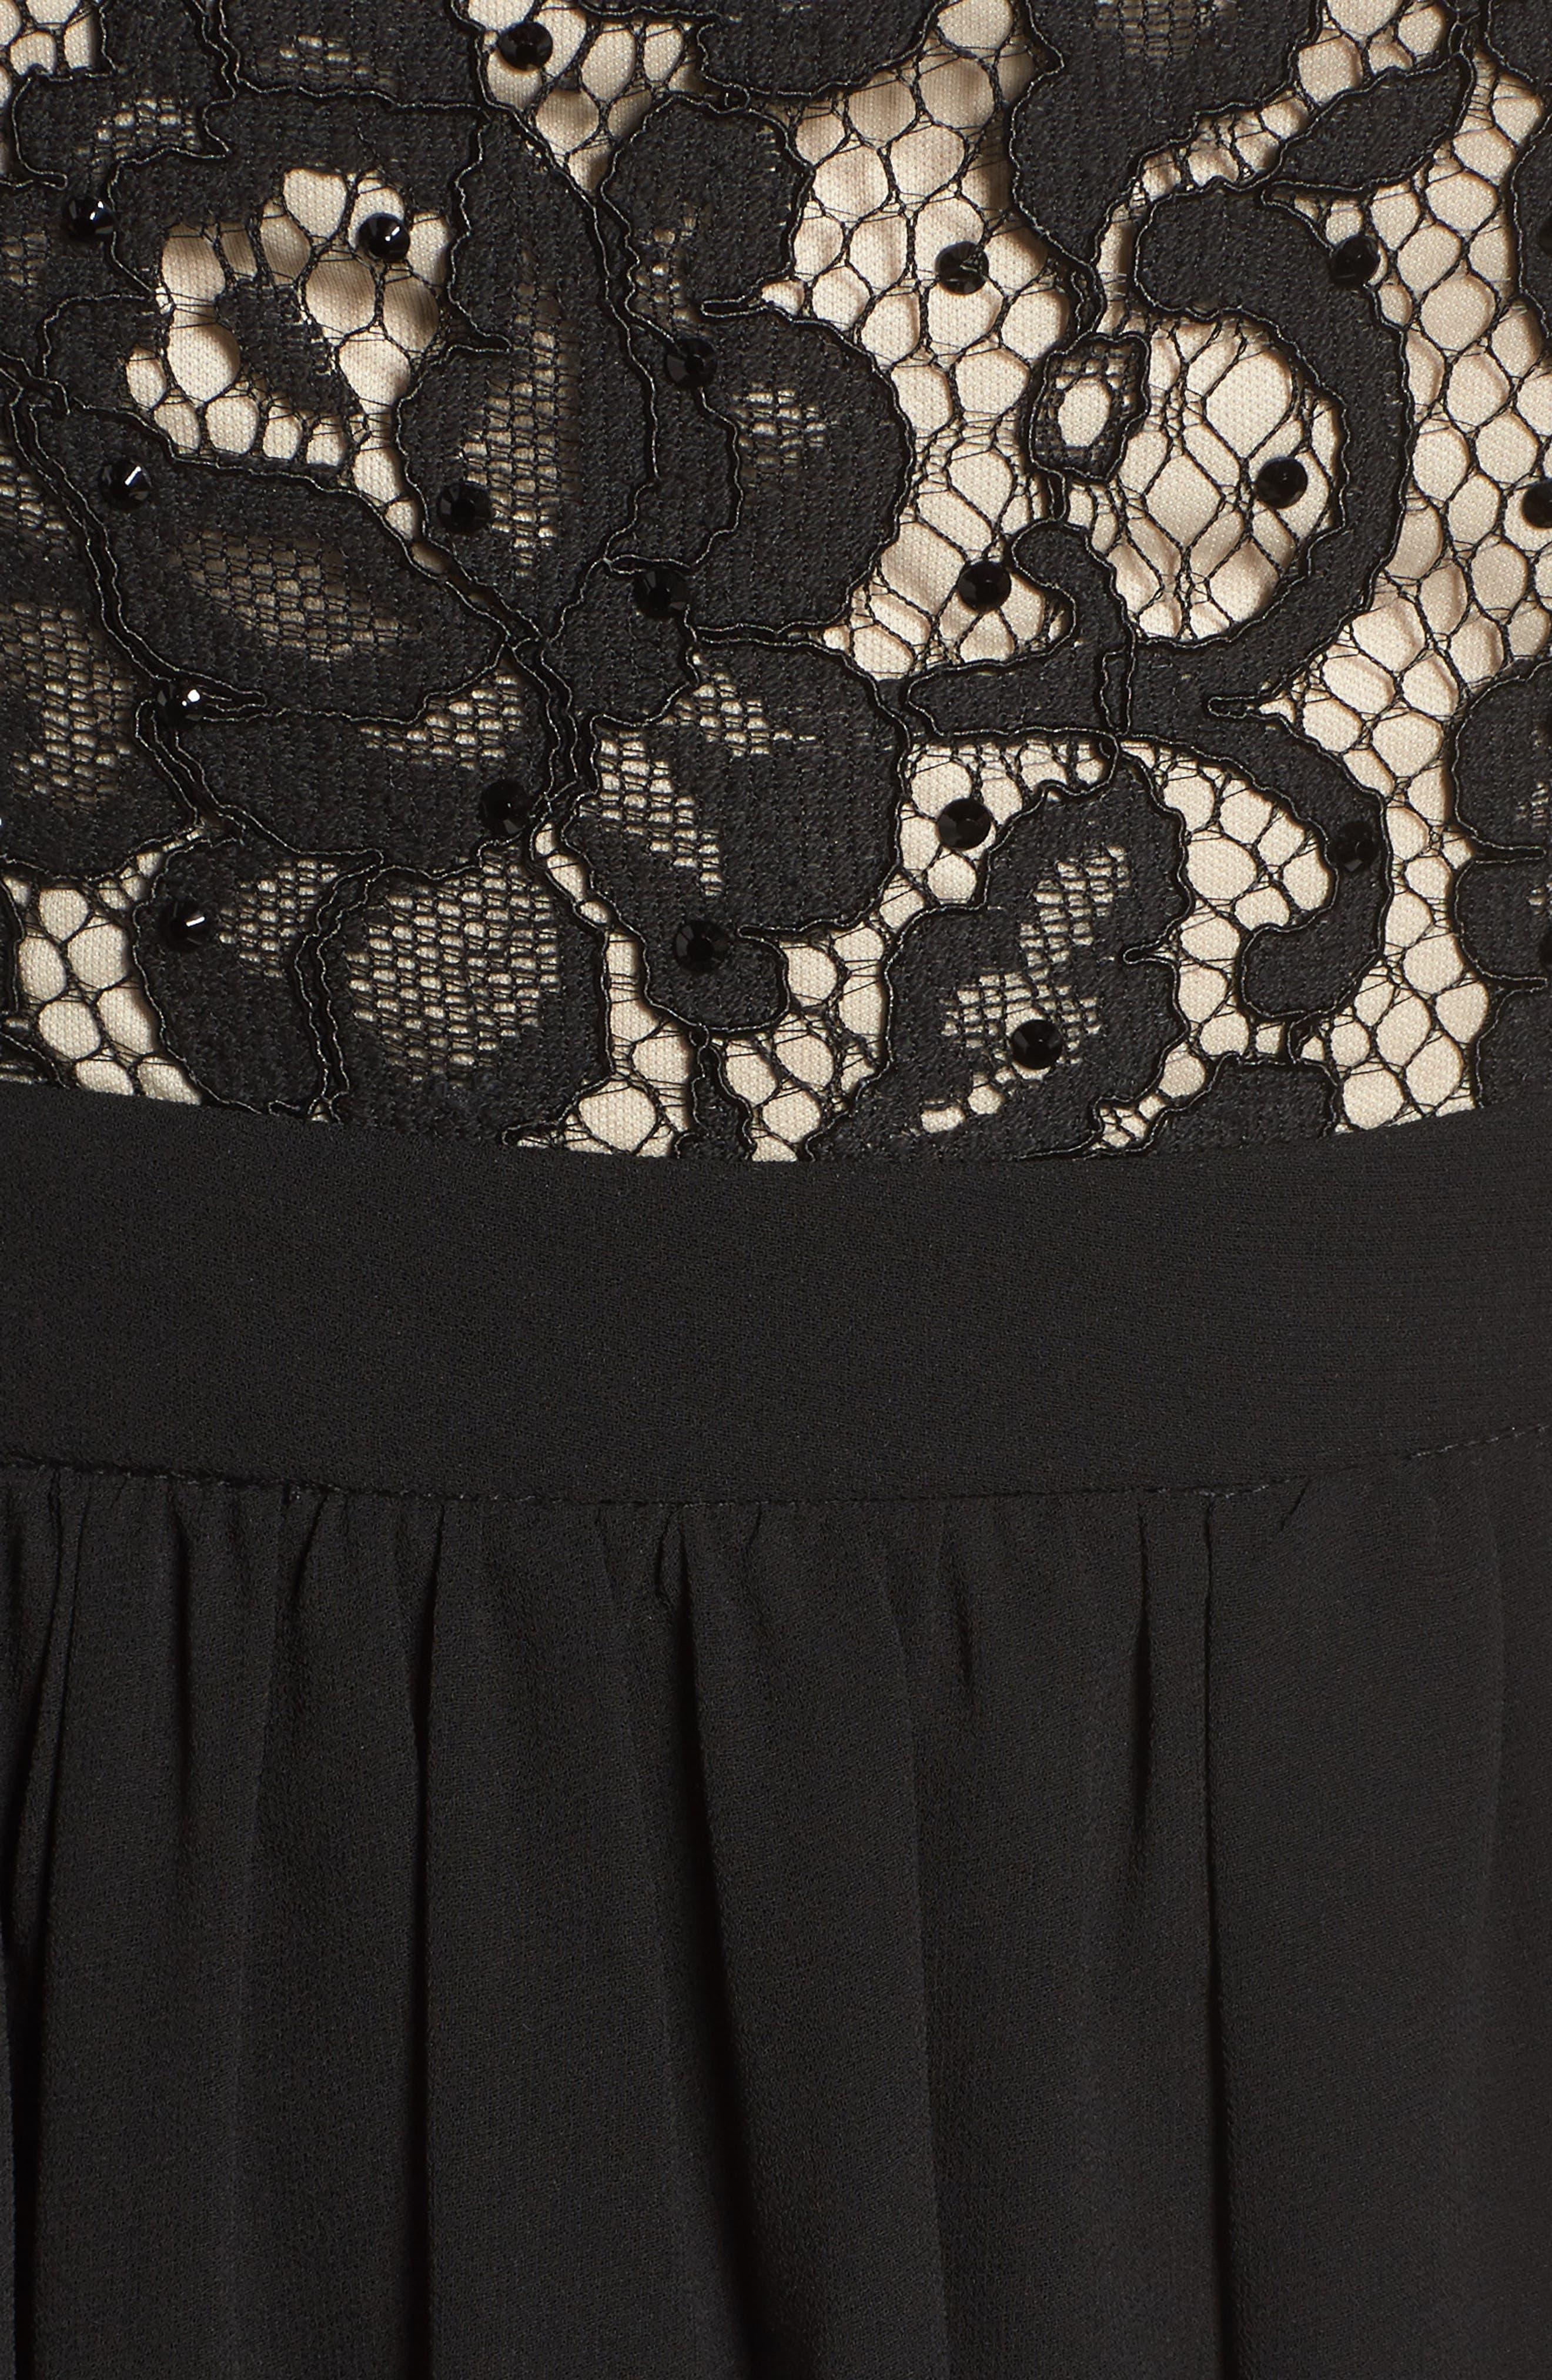 Sequin Lace & Chiffon Halter Gown,                             Alternate thumbnail 5, color,                             Black/ Nude